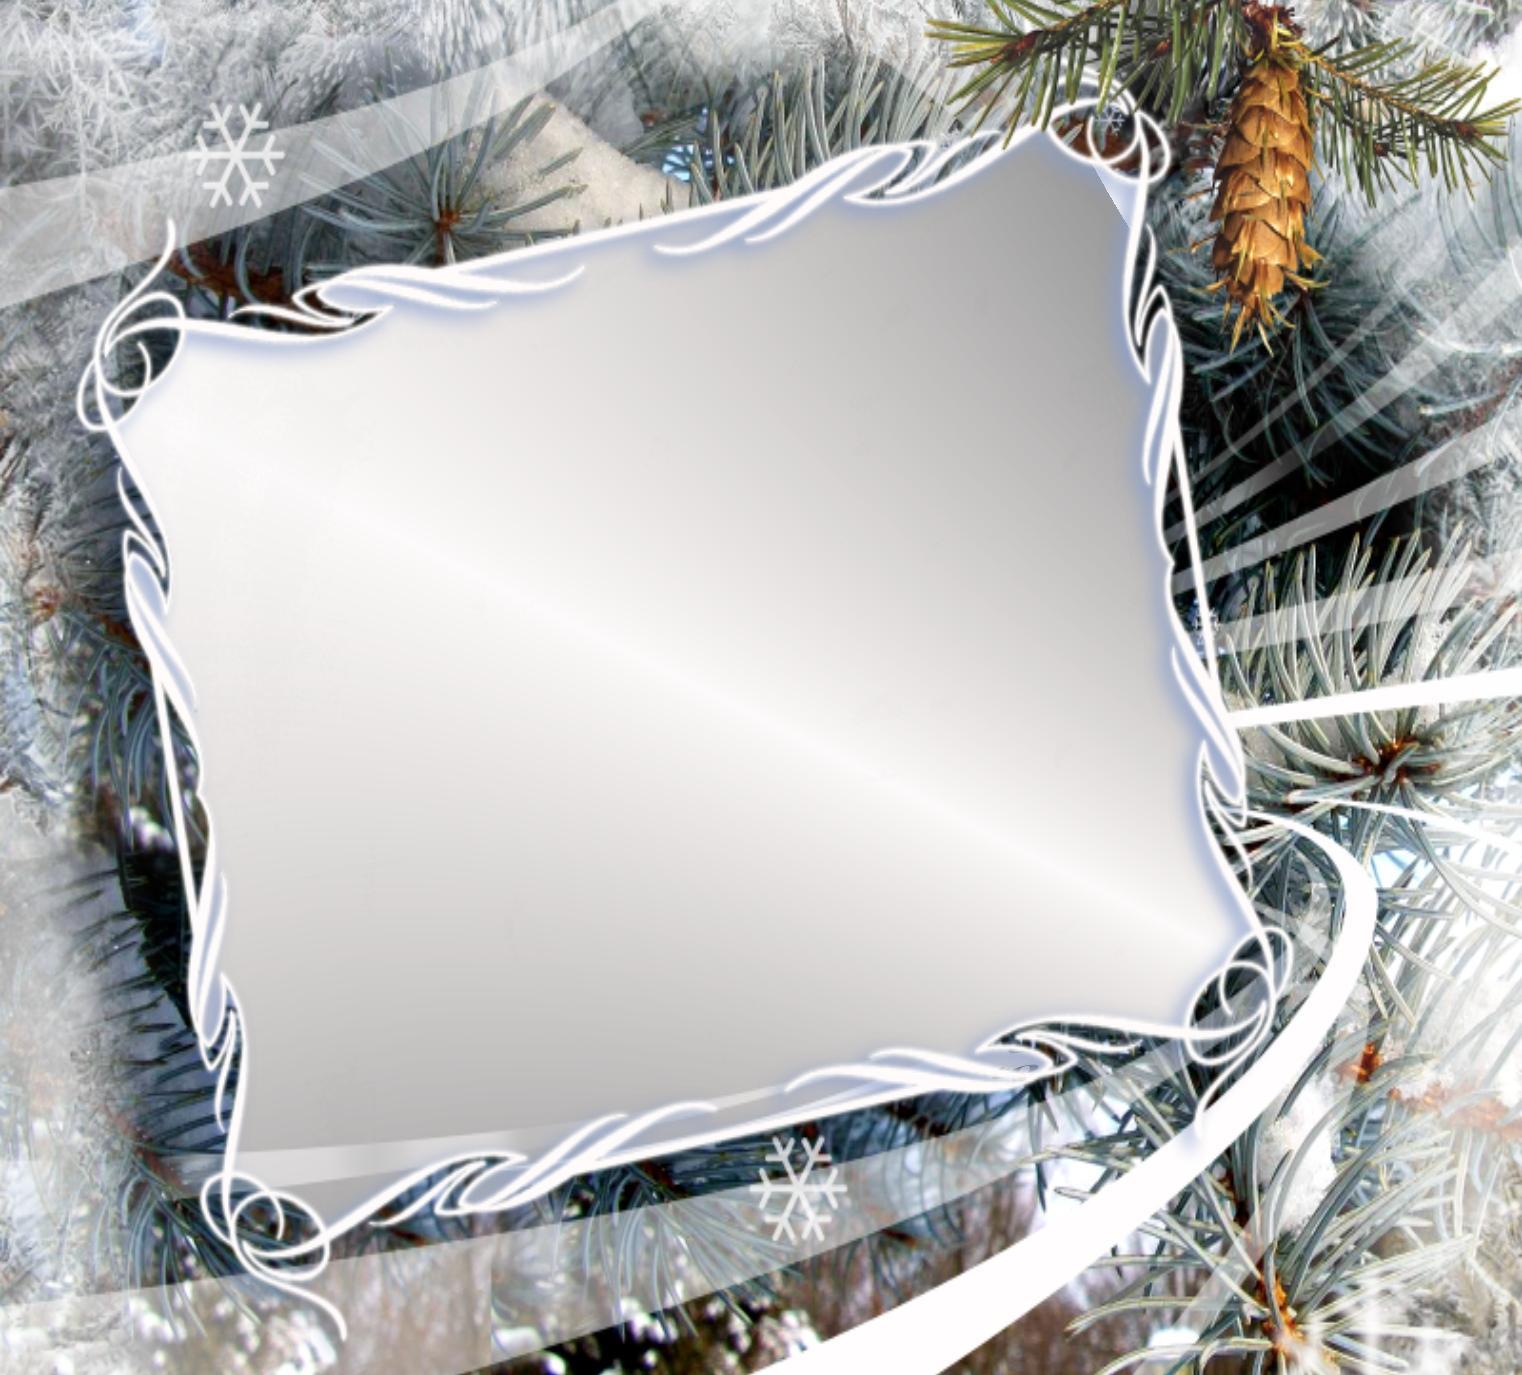 Atemberaubend Rahmen Mikimi Bild Fotos - Benutzerdefinierte ...